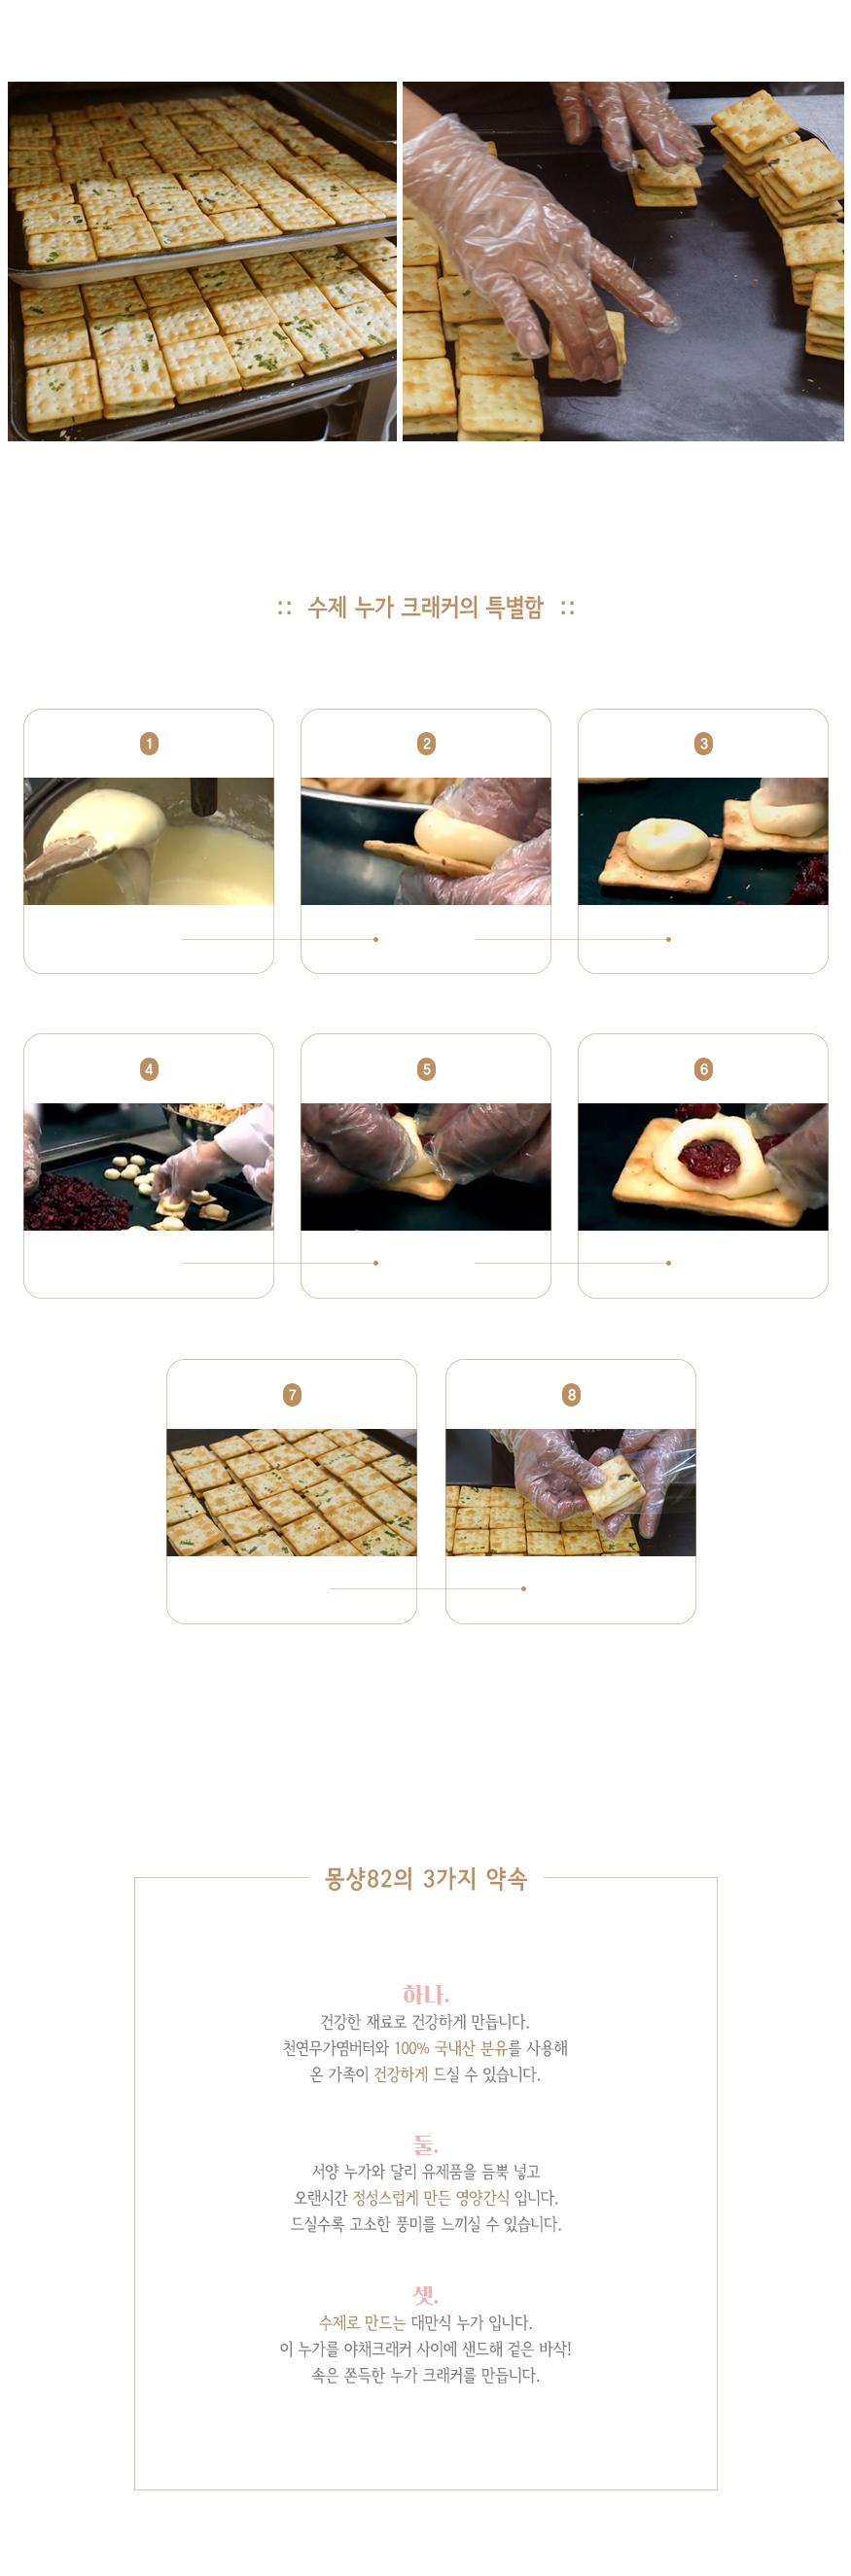 n_cracker_03.jpg